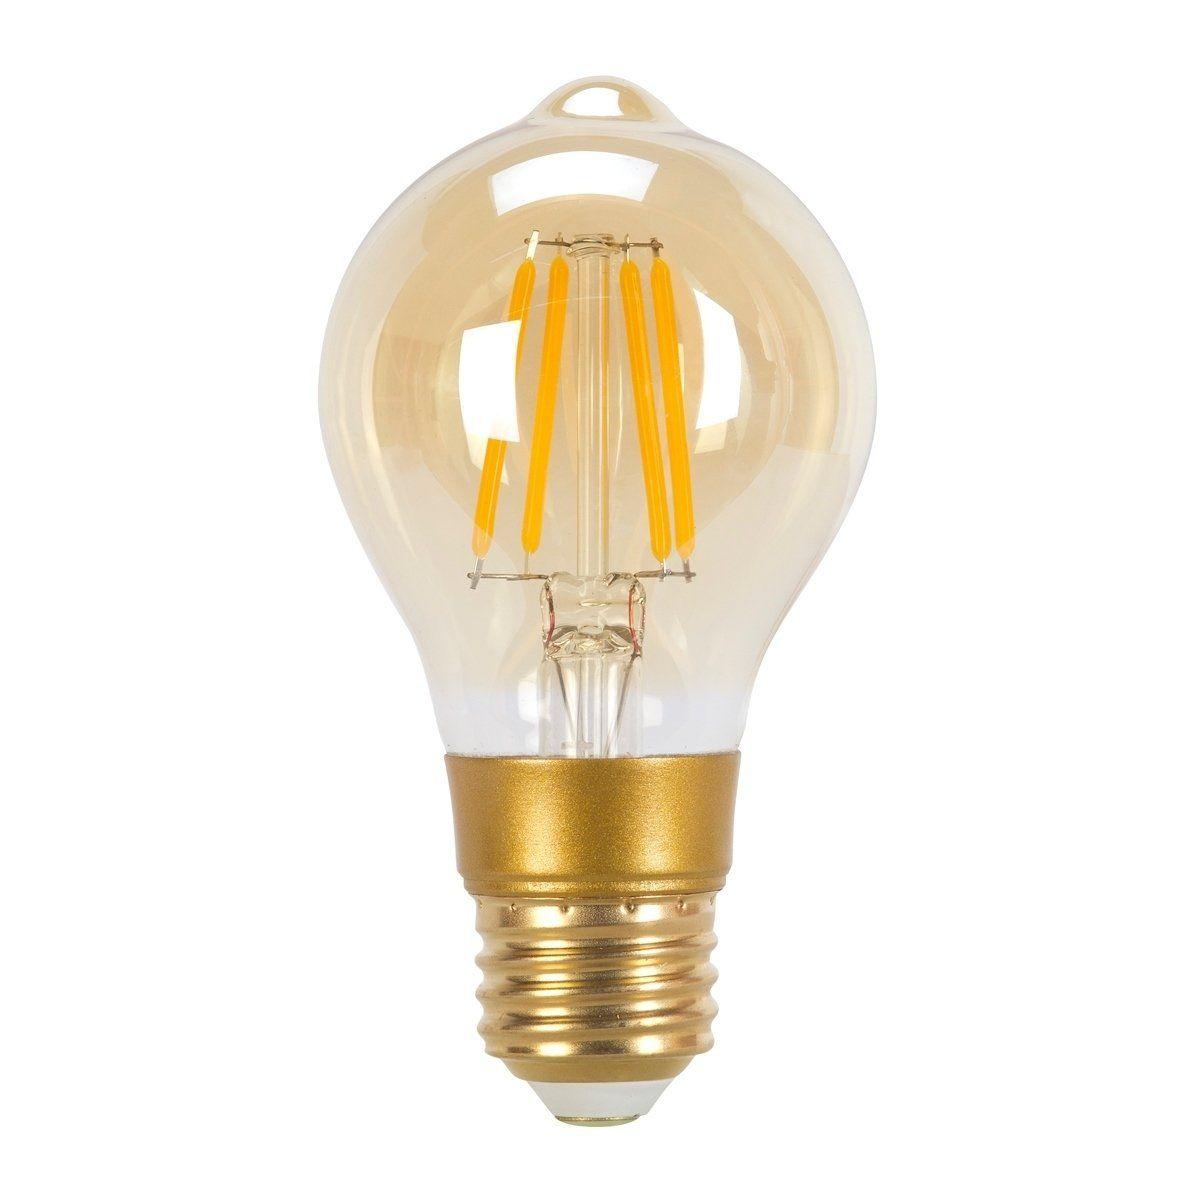 Flood Light Bulb Accent Reflector Amber 100 Watts Bulb Light